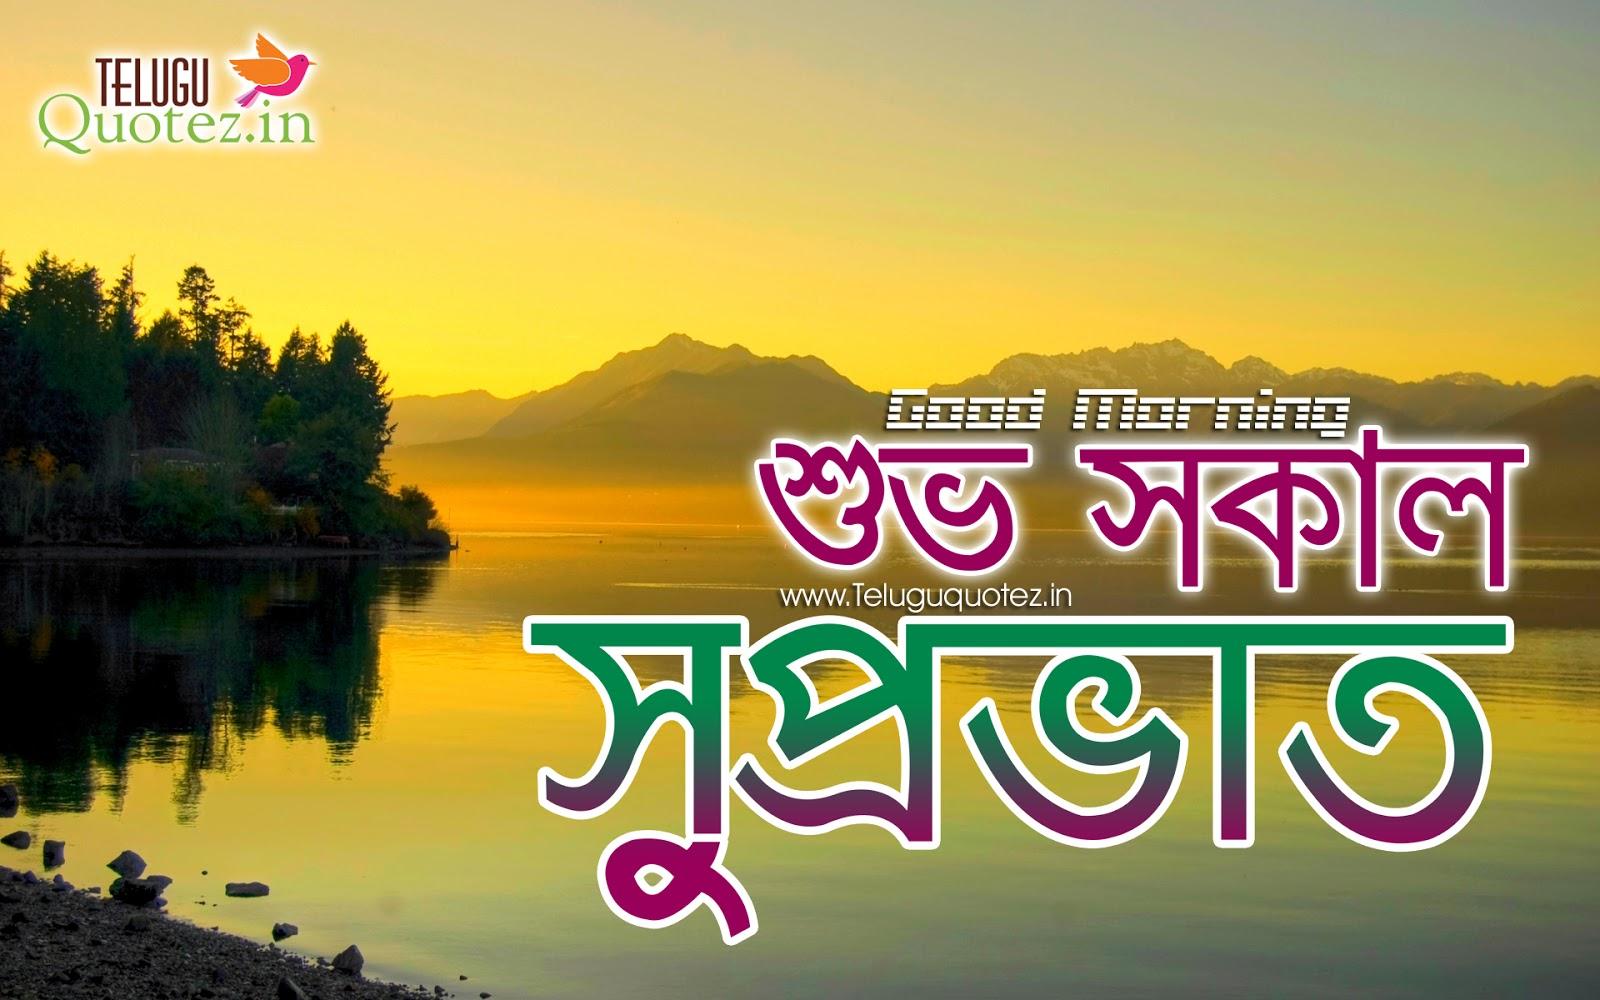 Good Morning Quotes Bengali : Bengali good morning quotes images teluguquotez